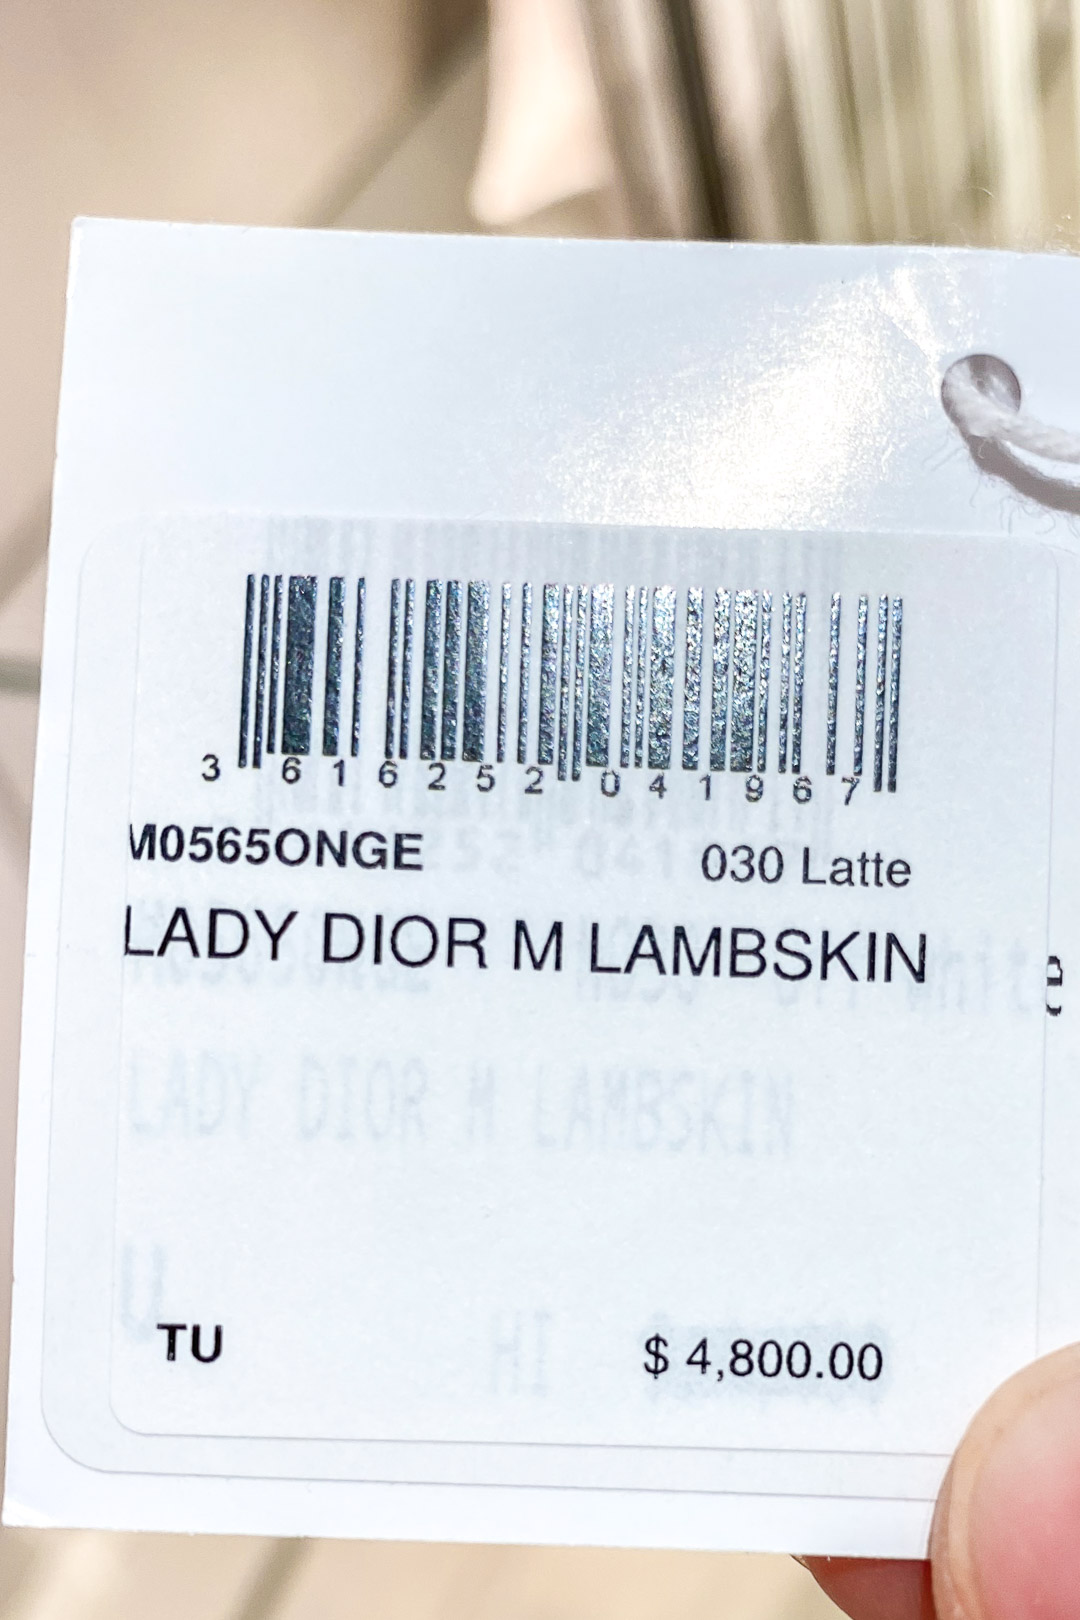 Christian Dior Hawaii Pricing for Medium Lady Dior Bag